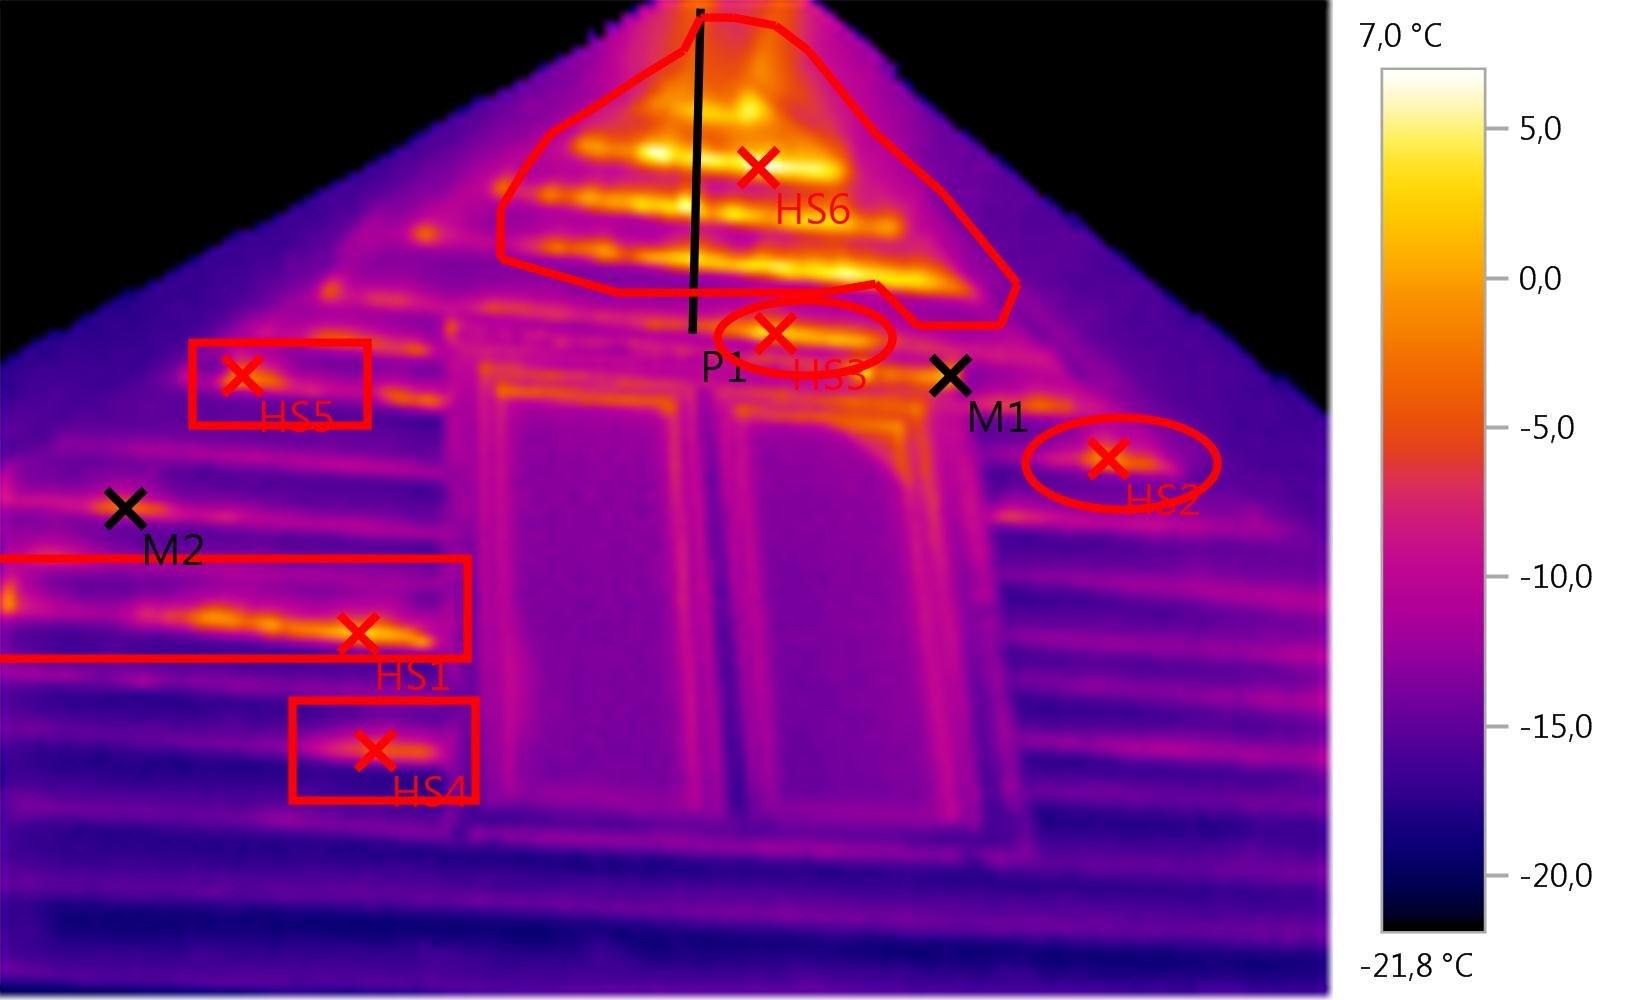 Методы тепловизионных исследований фото